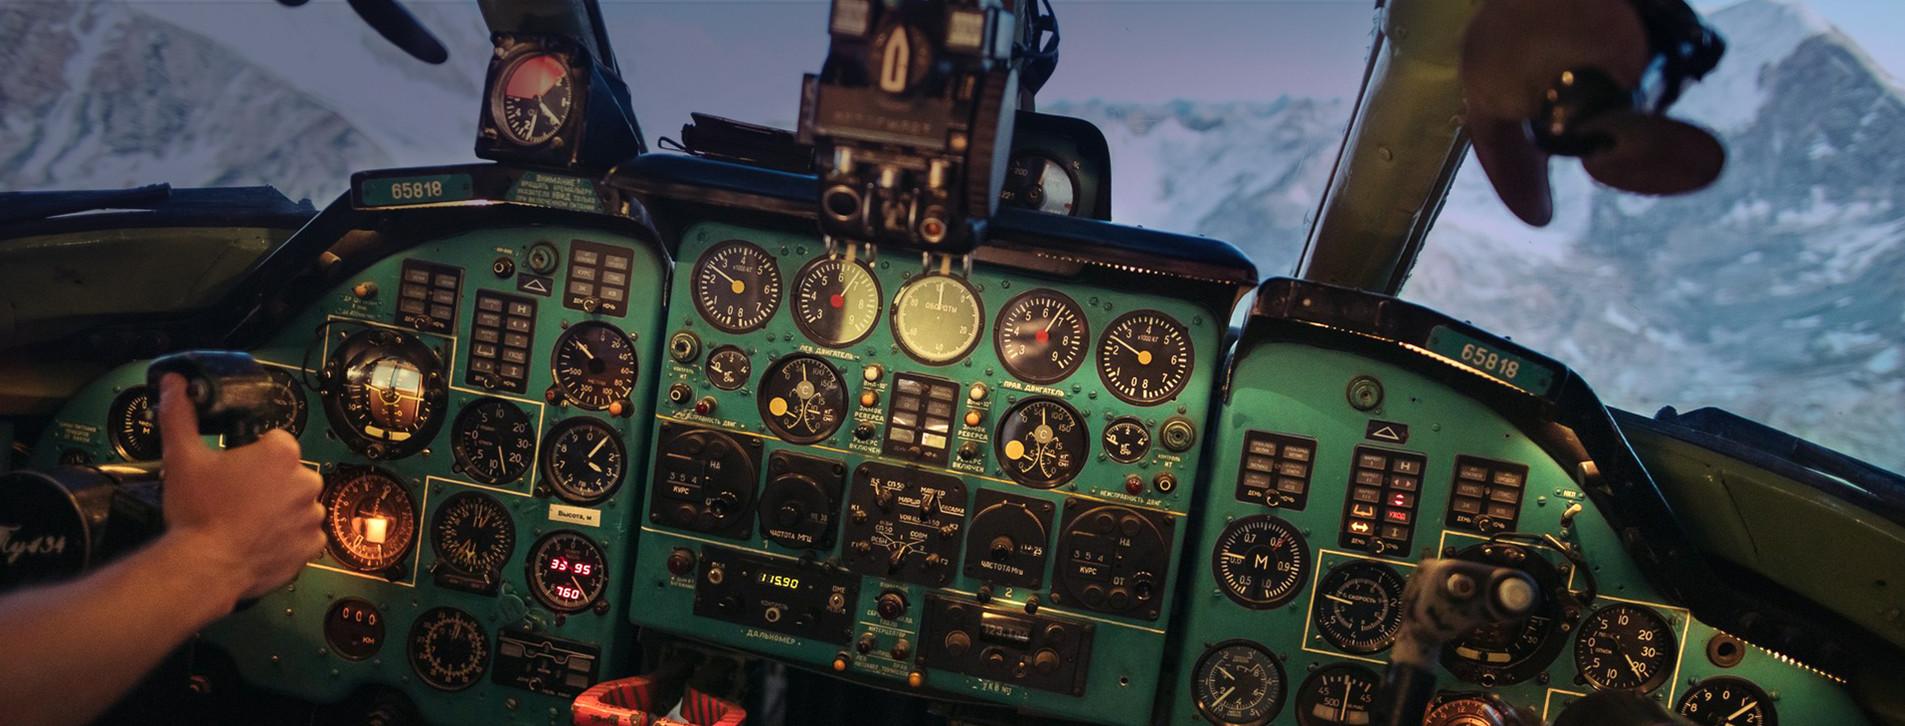 Фото 1 - Авиасимулятор ТУ-134 для компании